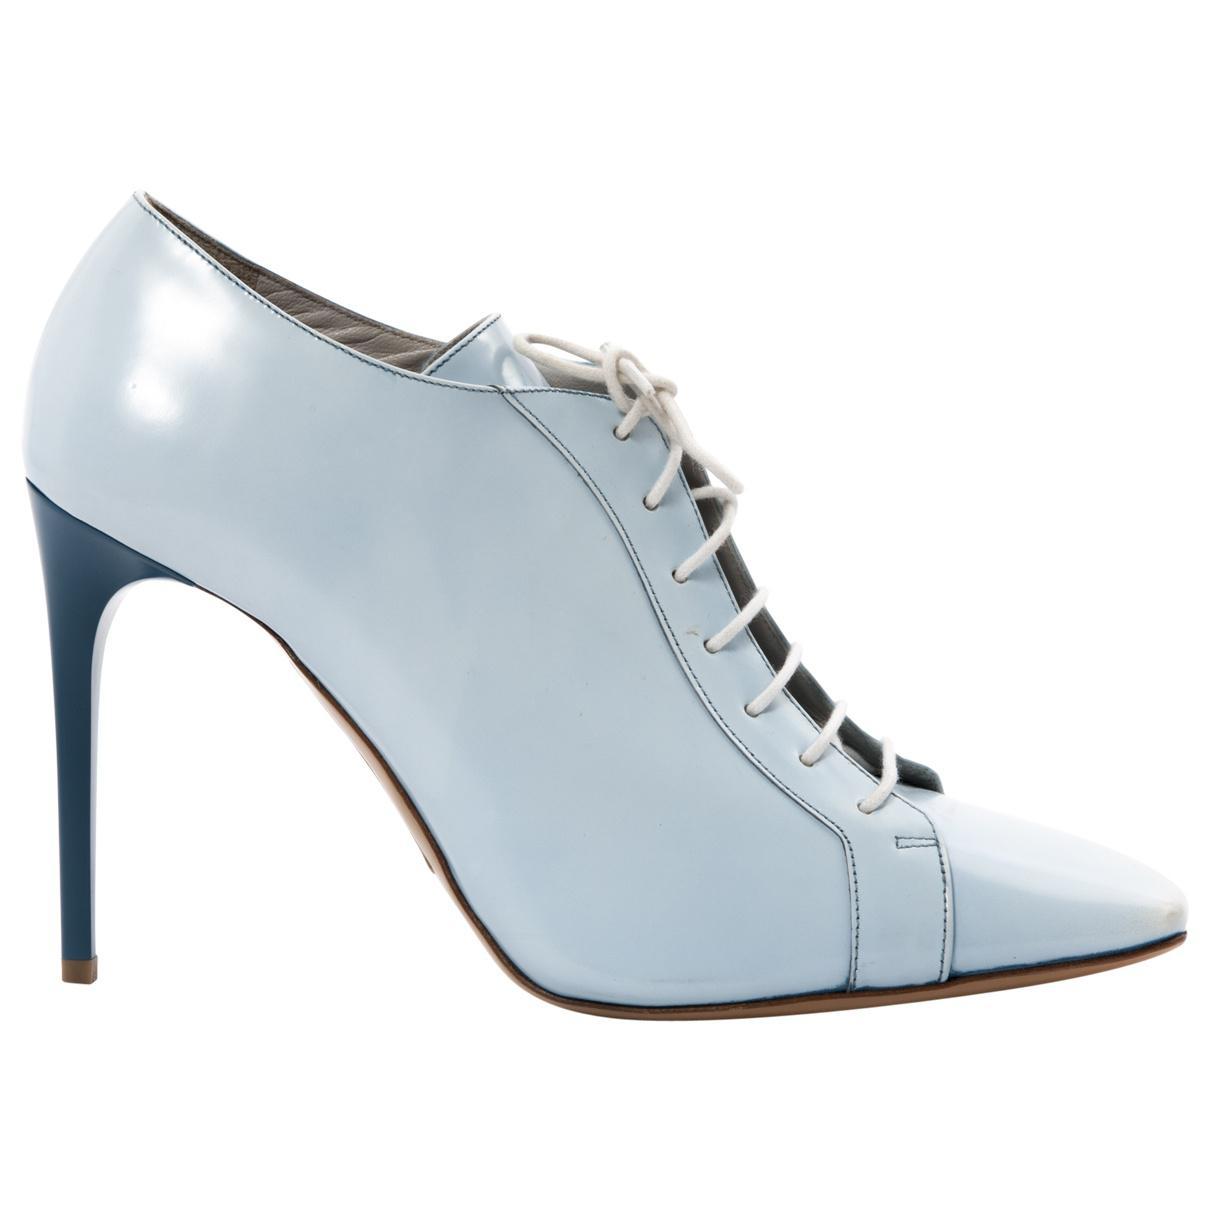 Pre-owned - Cloth heels Acne Studios aFzTKpY8